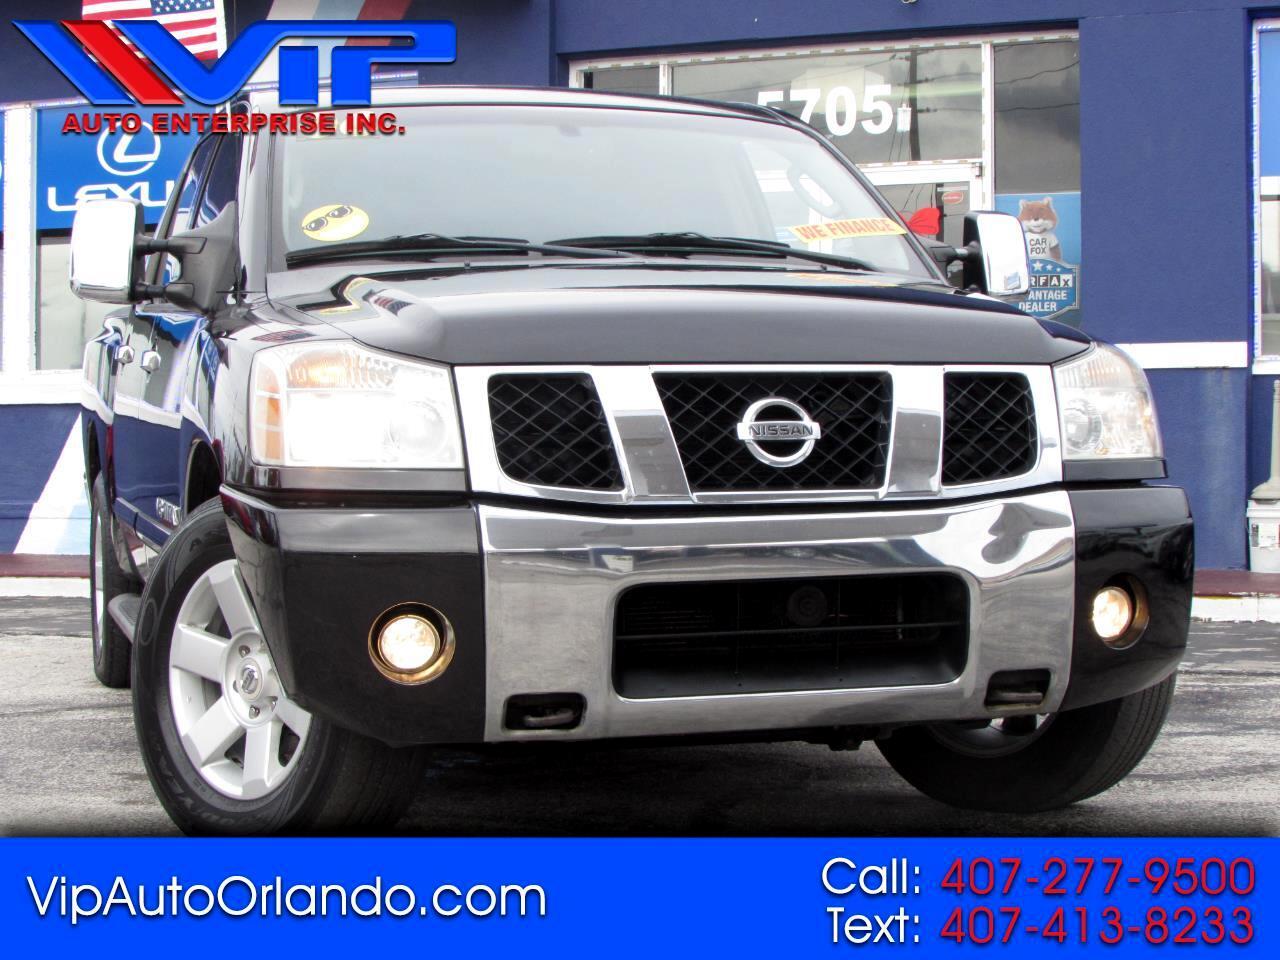 Nissan Titan LE Crew Cab 2WD FFV 2006